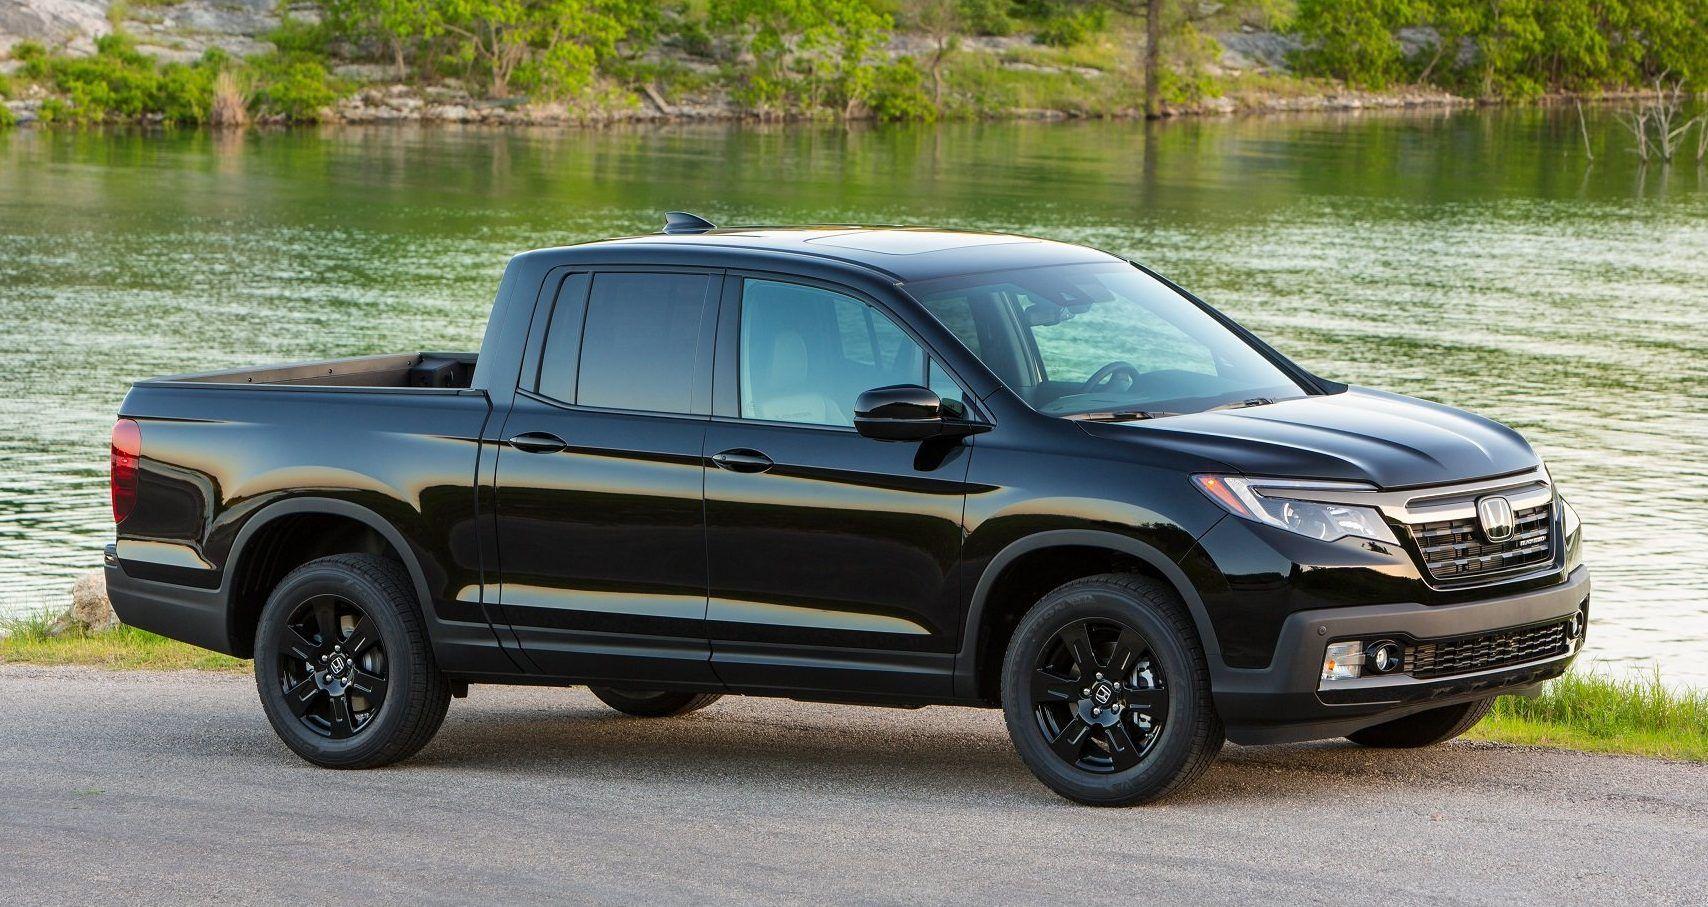 2018 Honda Ridgeline Black Edition Preview & Buyer's Guide